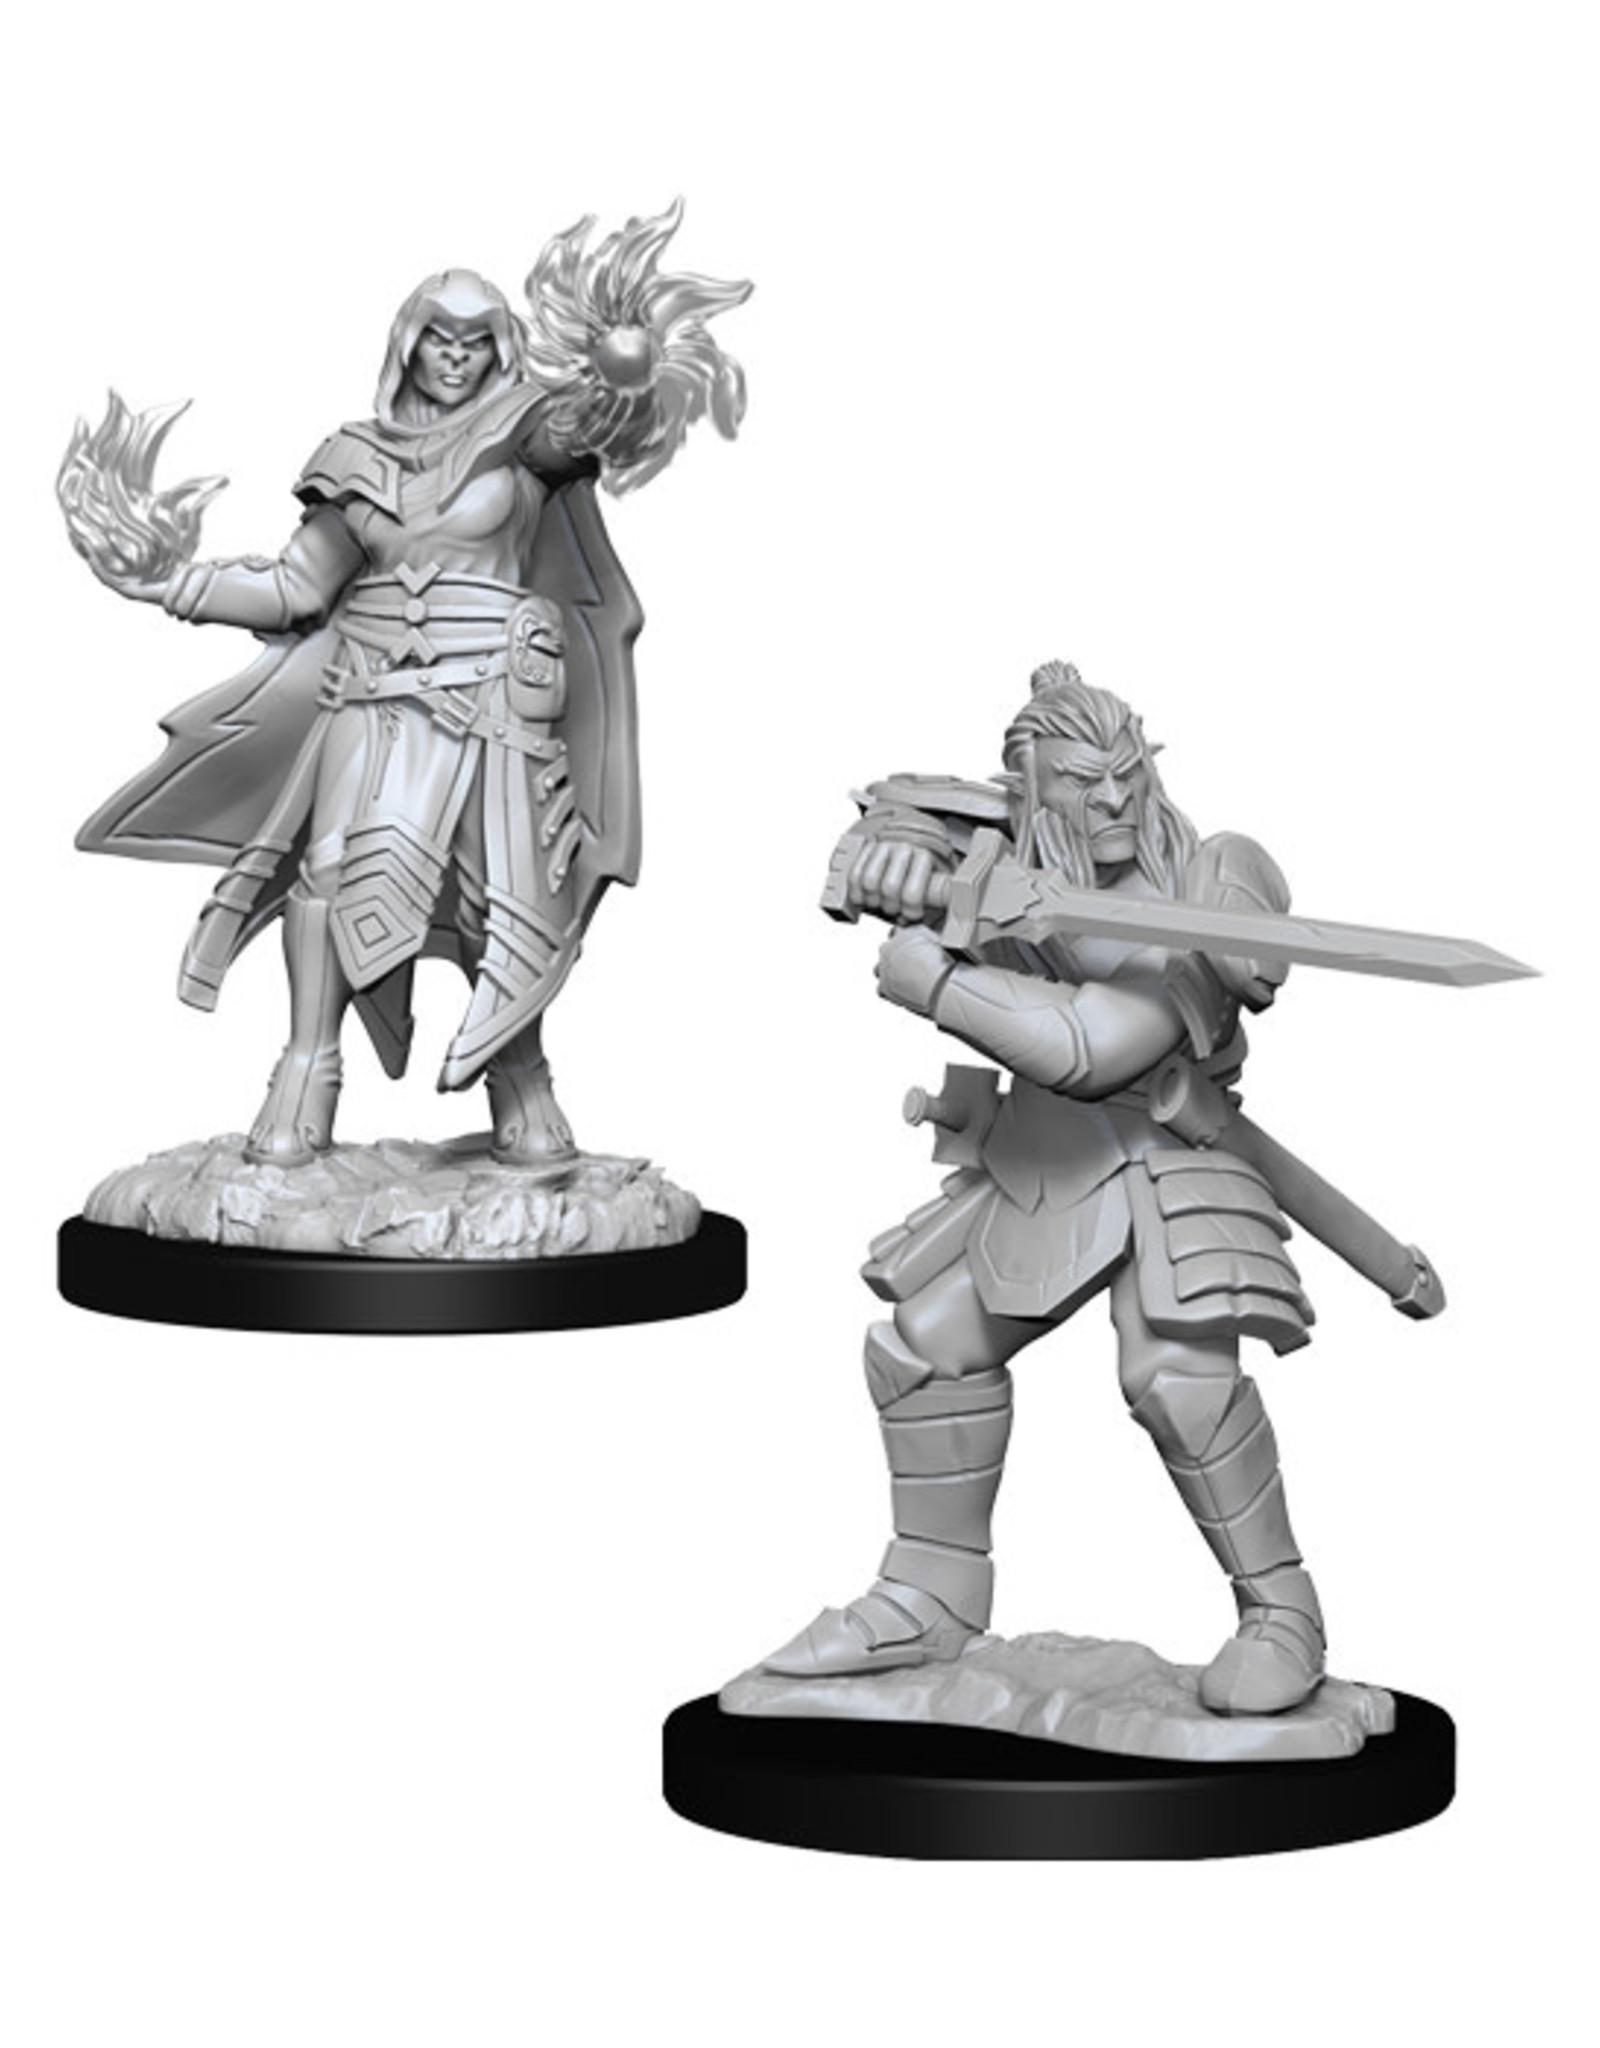 Dungeons & Dragons Dungeons & Dragons: Nolzur's - Hobgoblin Male Fighter & Hobgoblin Female Wizard